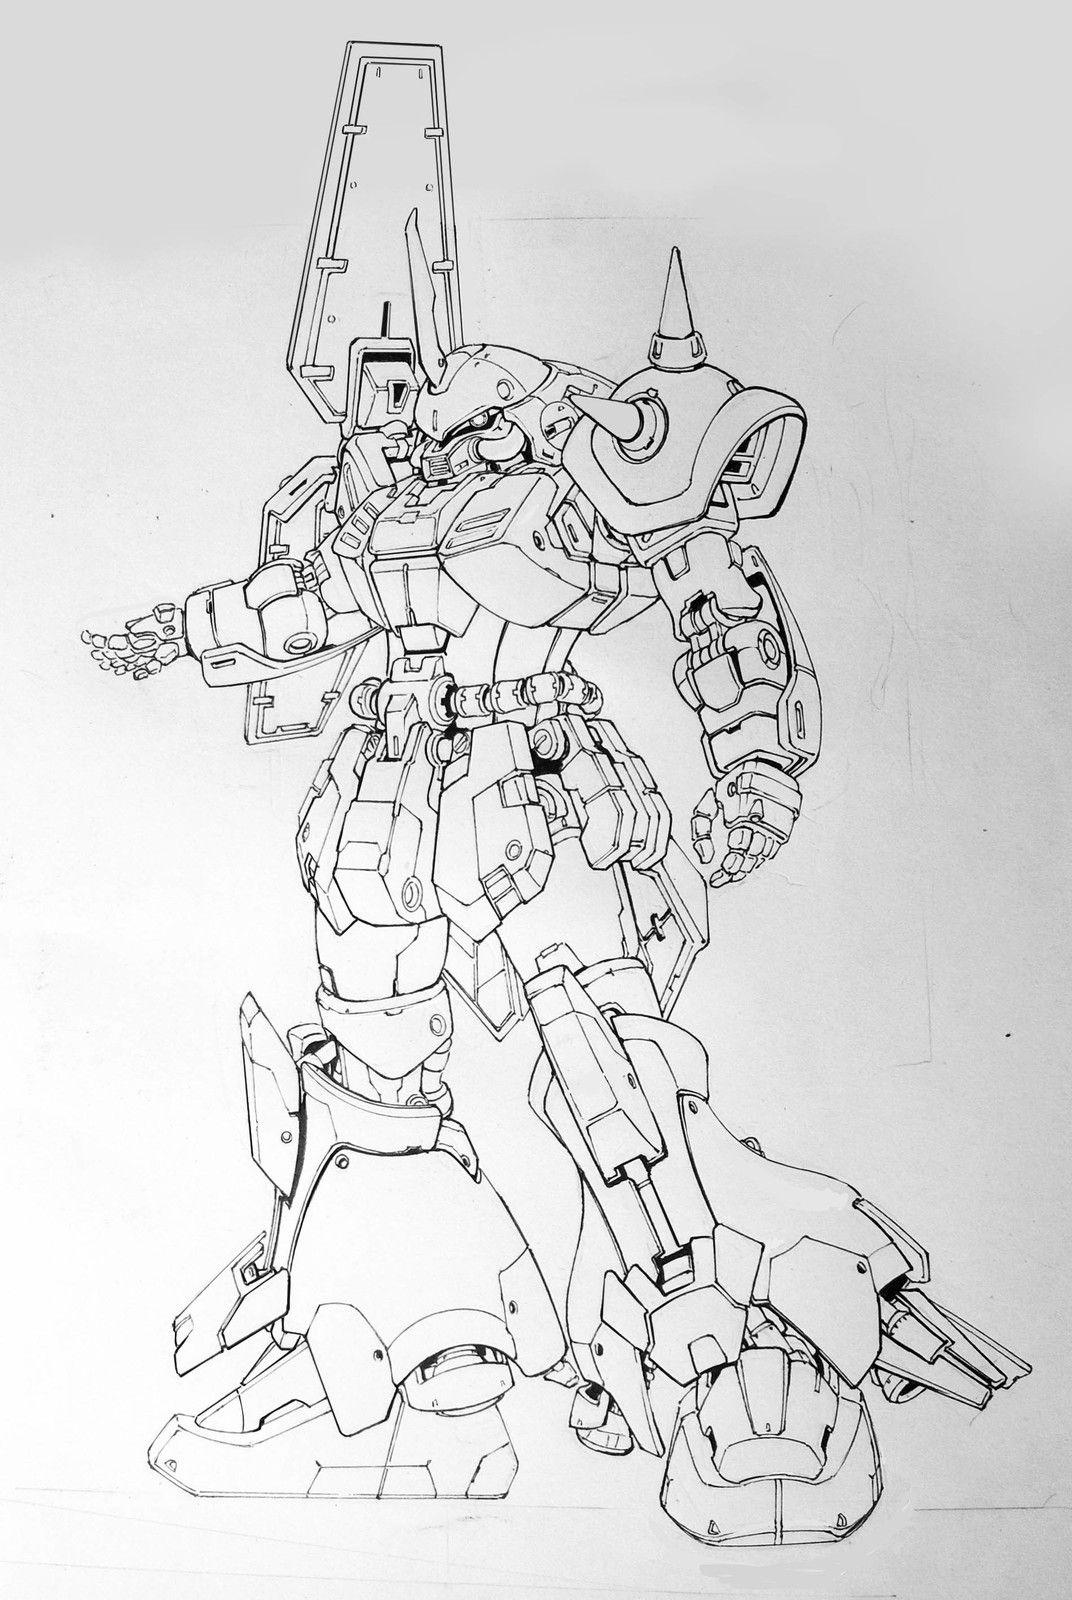 Pin By David Velez On Art In 2020 Gundam Art Robots Drawing